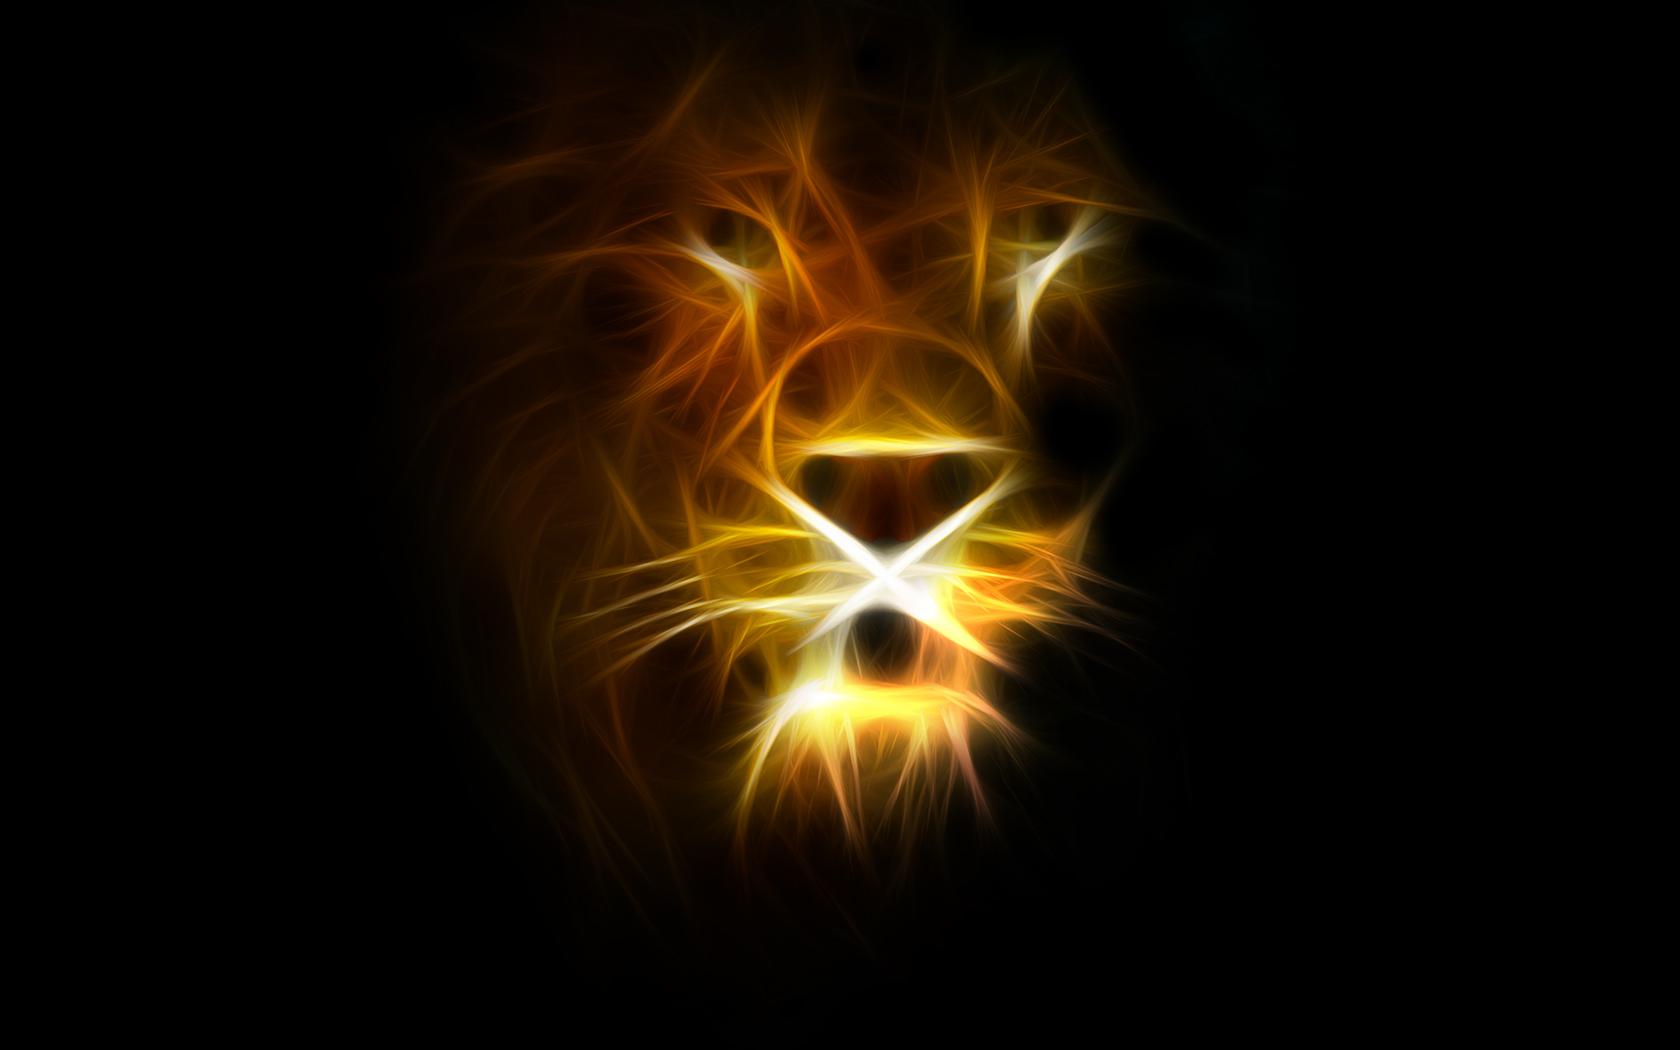 aslan resmi desktop wallpaper hd aslan hd desktop hd resim hd resimler 1680x1050